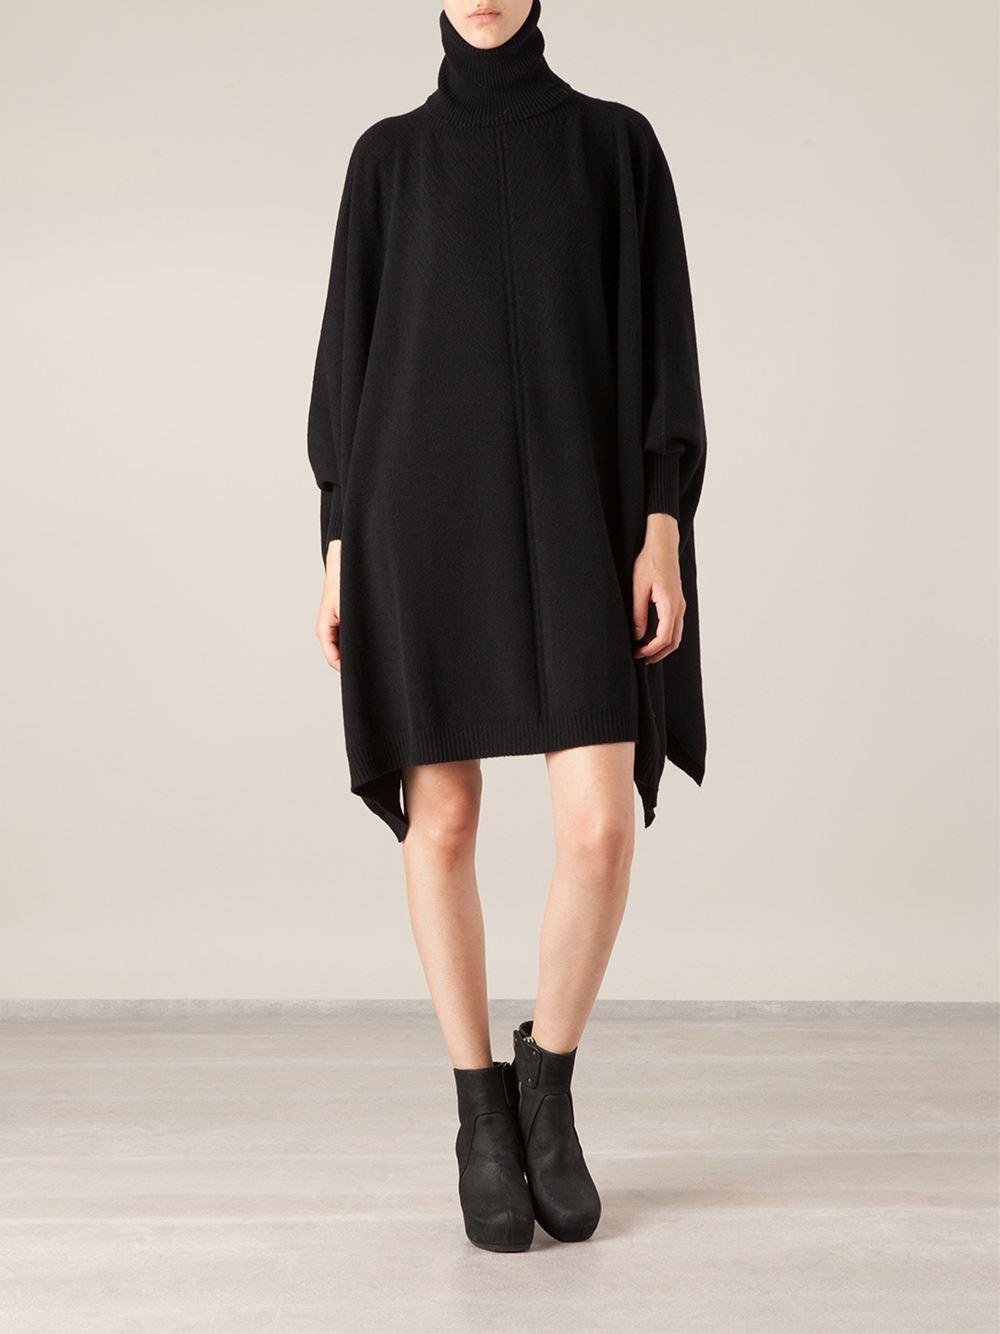 c098f42a1c5 Lyst - Lamberto Losani Oversized Sweater Dress in Black